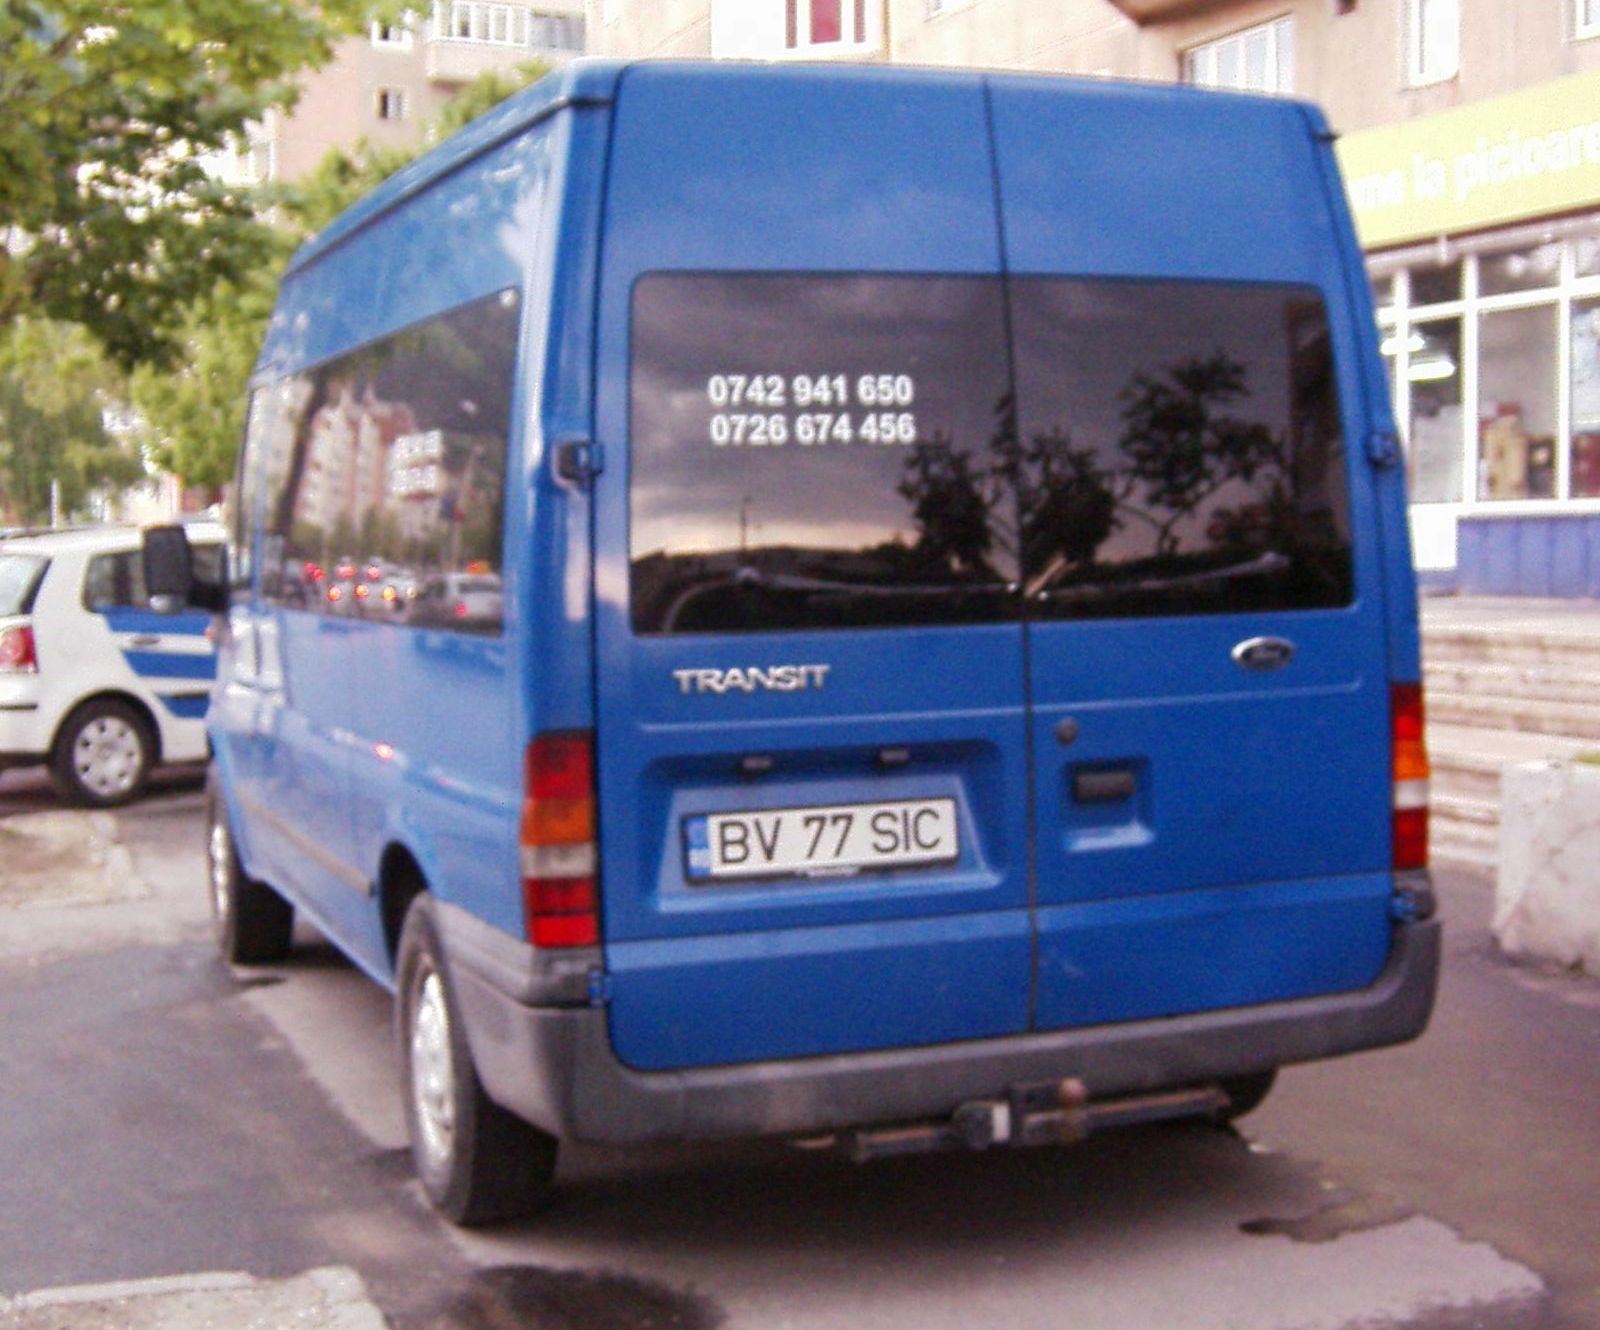 Vand ford transit 2,4 tdi an 2000 itp 2010 euro3